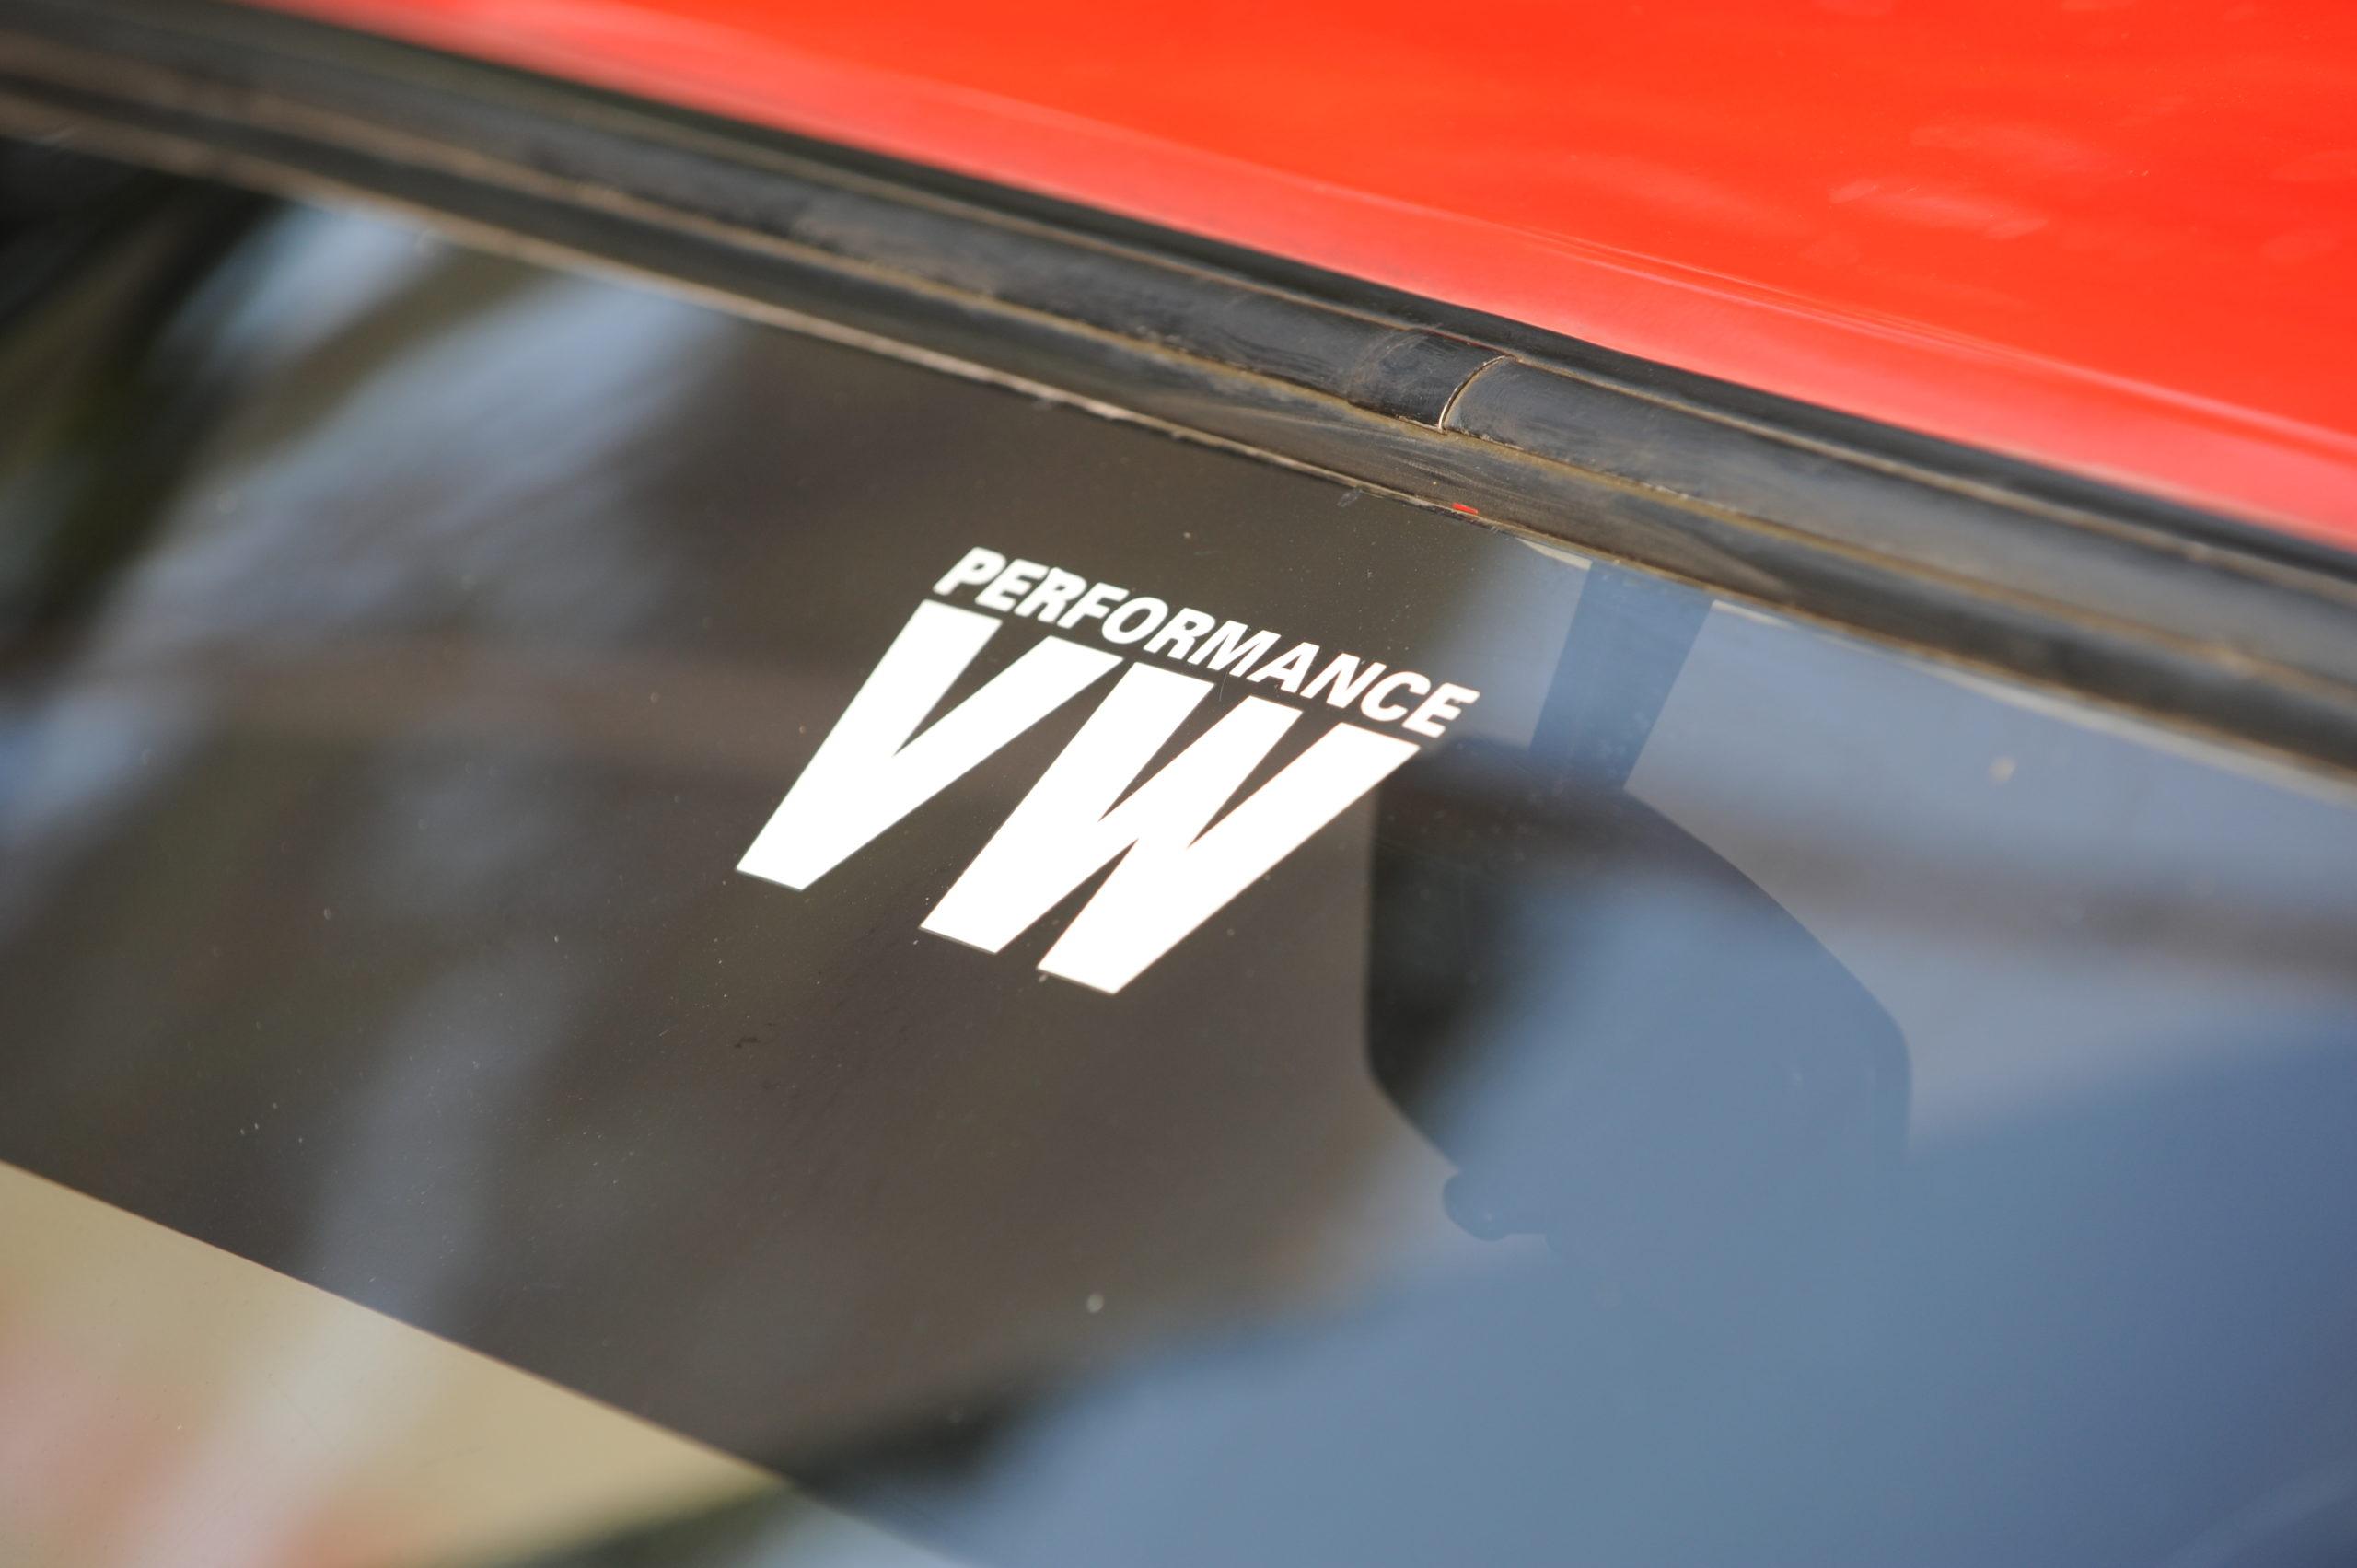 Tuning-VW-Scirocco-1-Typ-53-nalepka VW performance